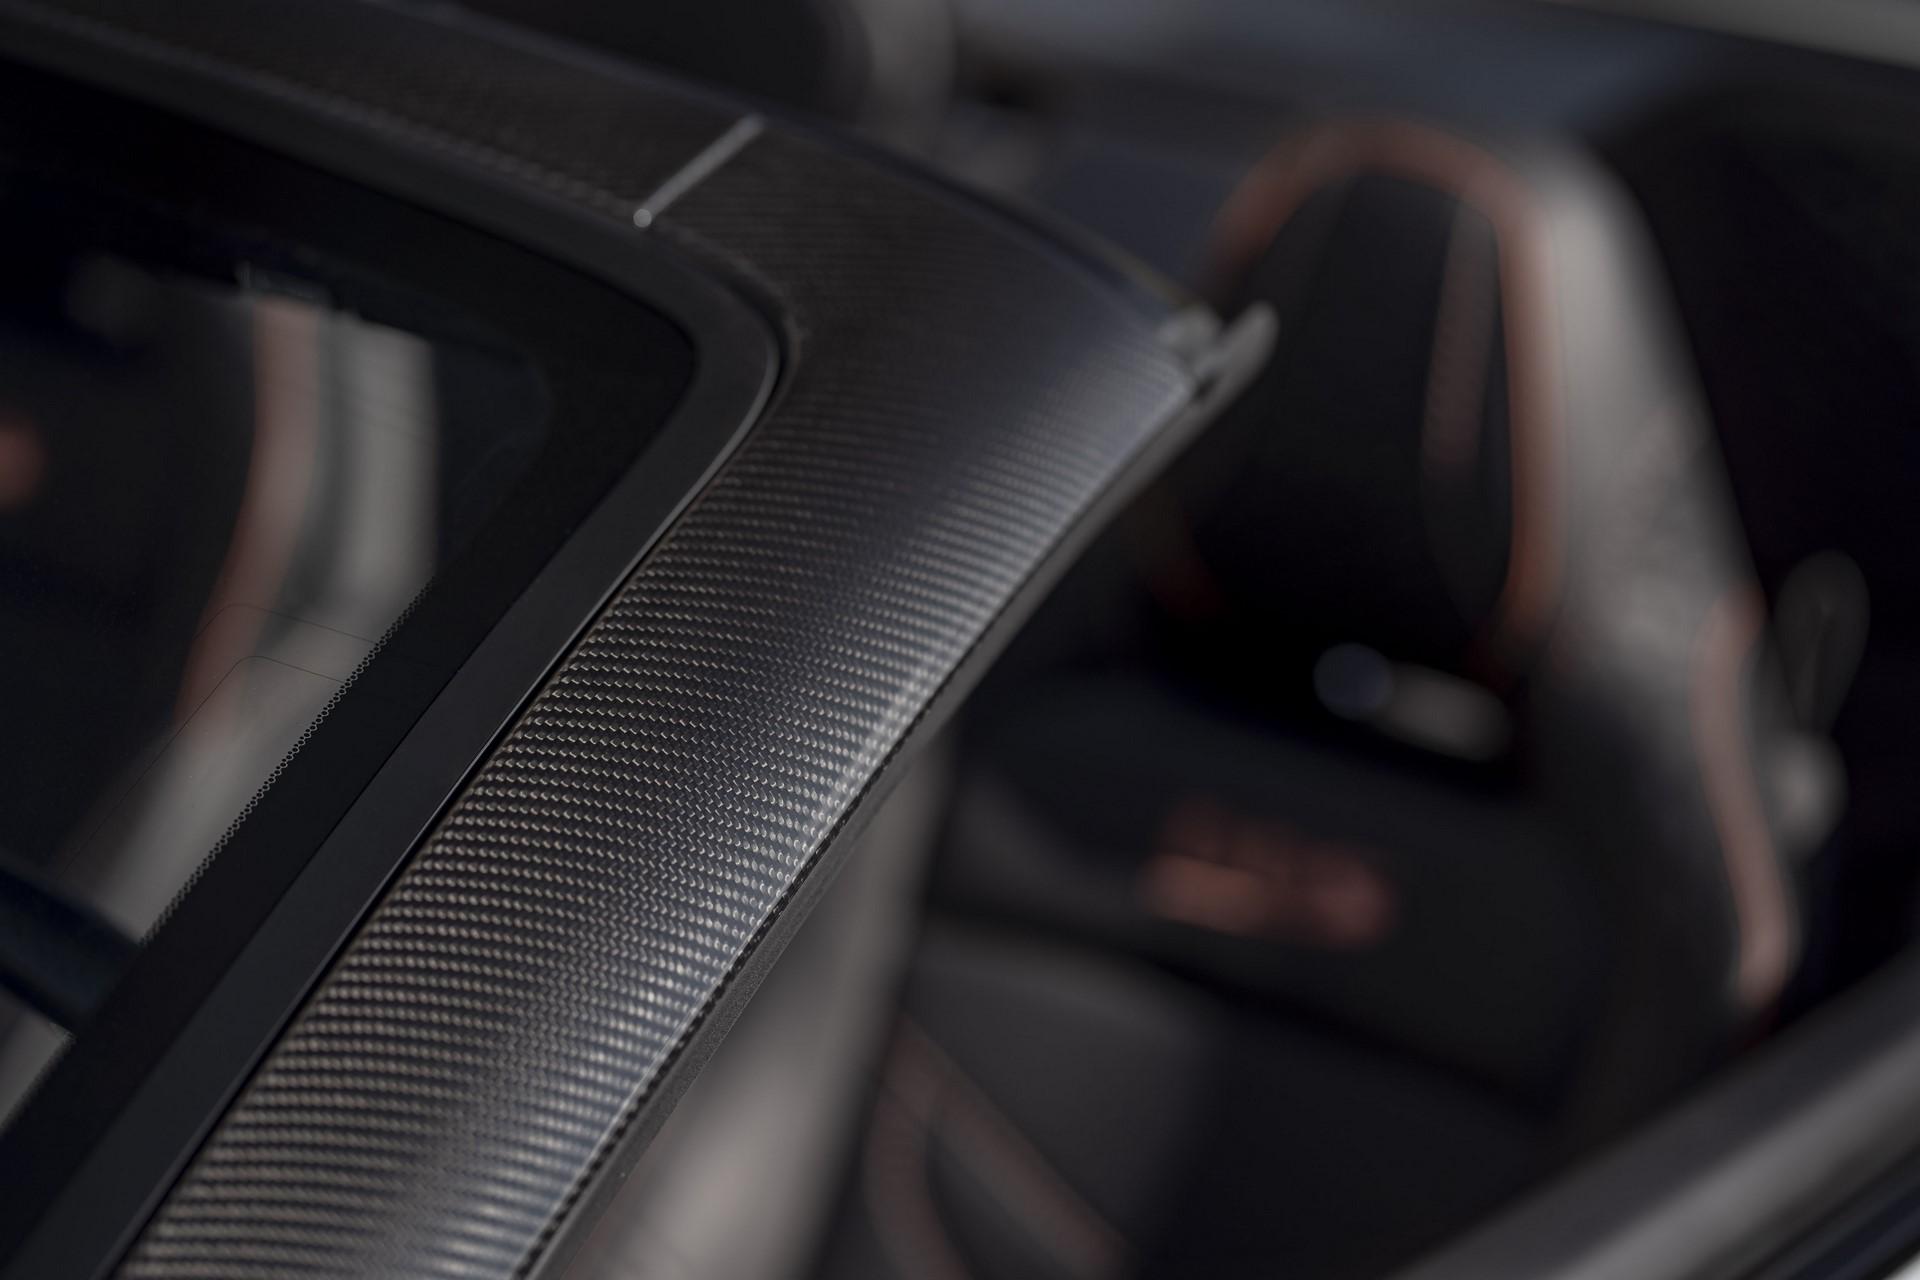 Aston-Martin-DBS-Superleggera-Volante-2